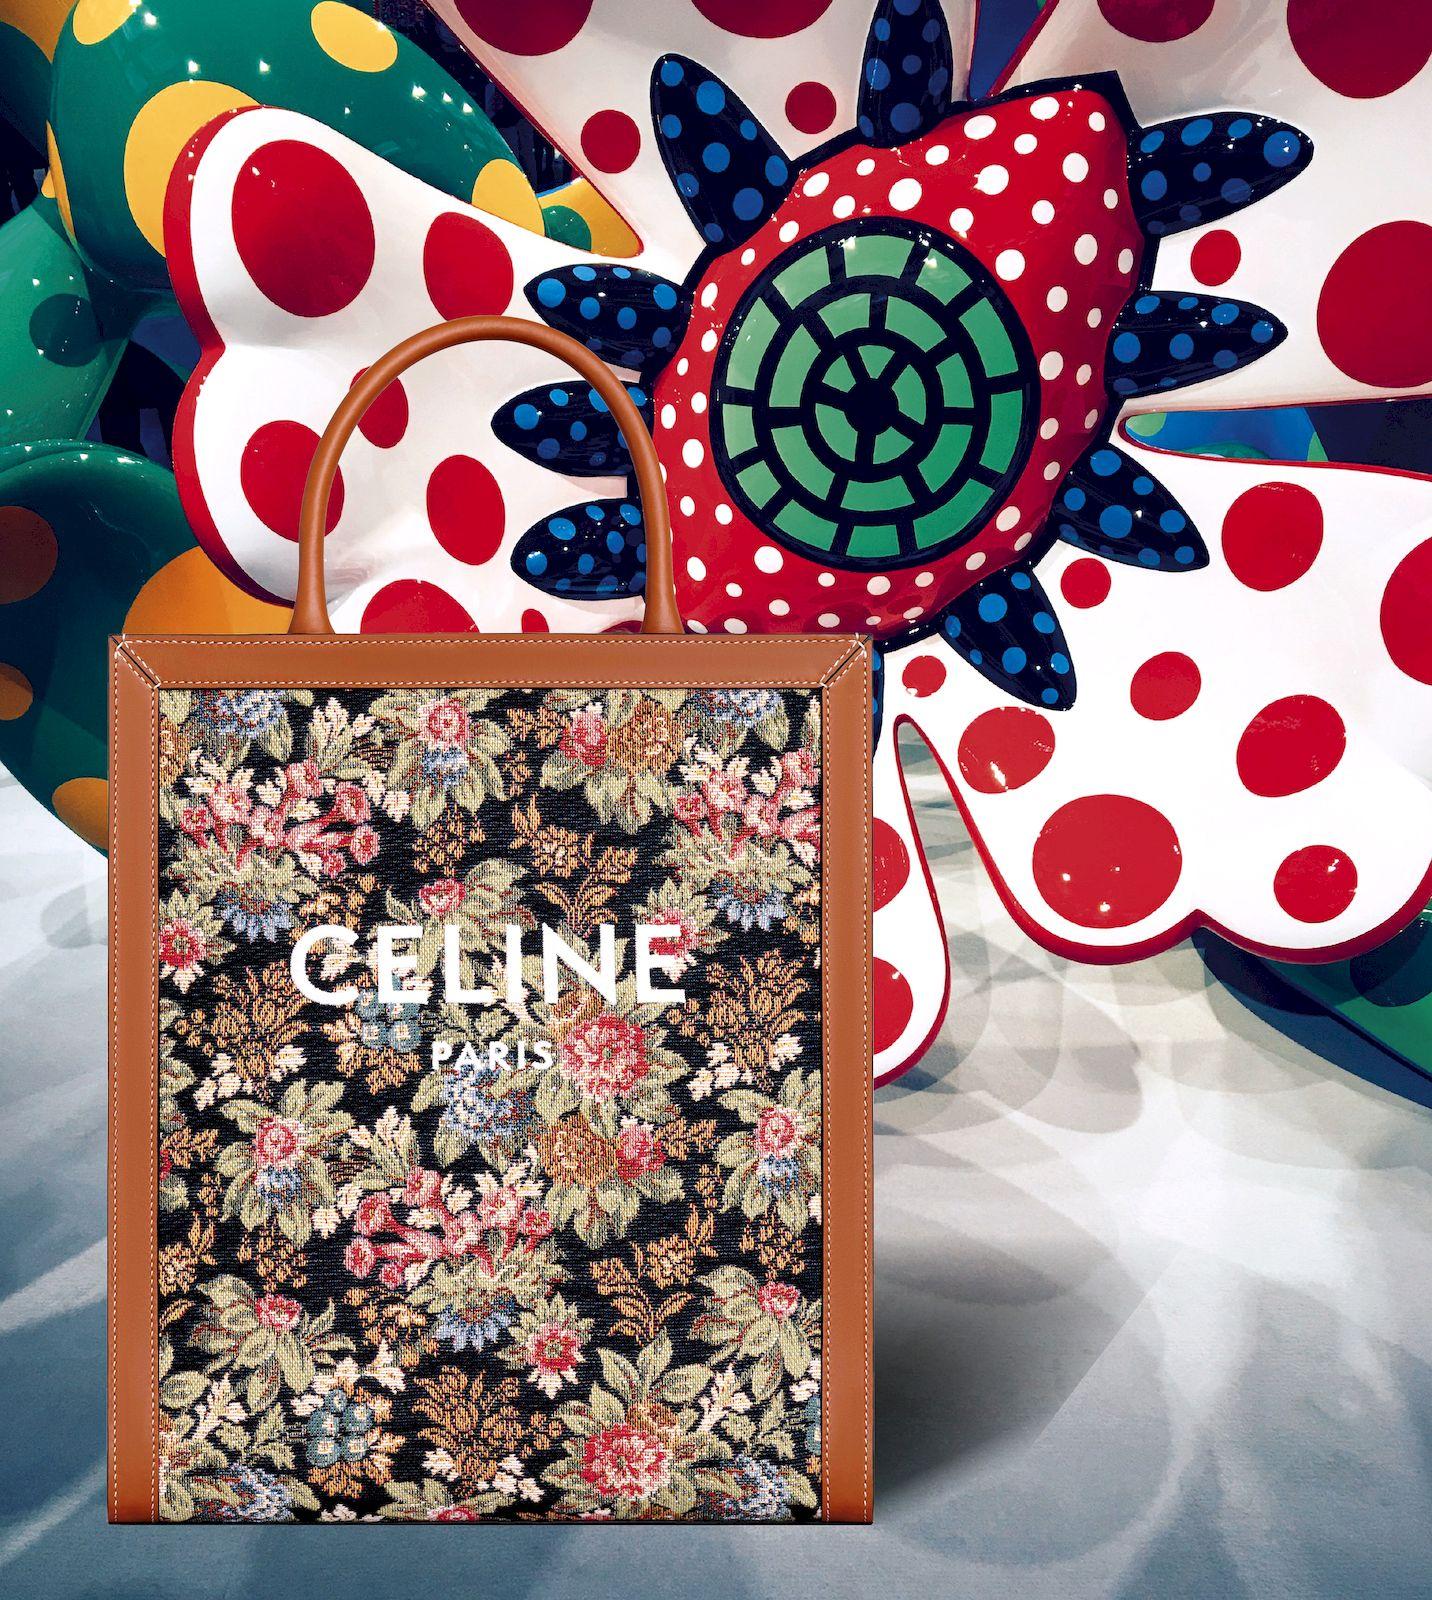 Celine Cabas tote